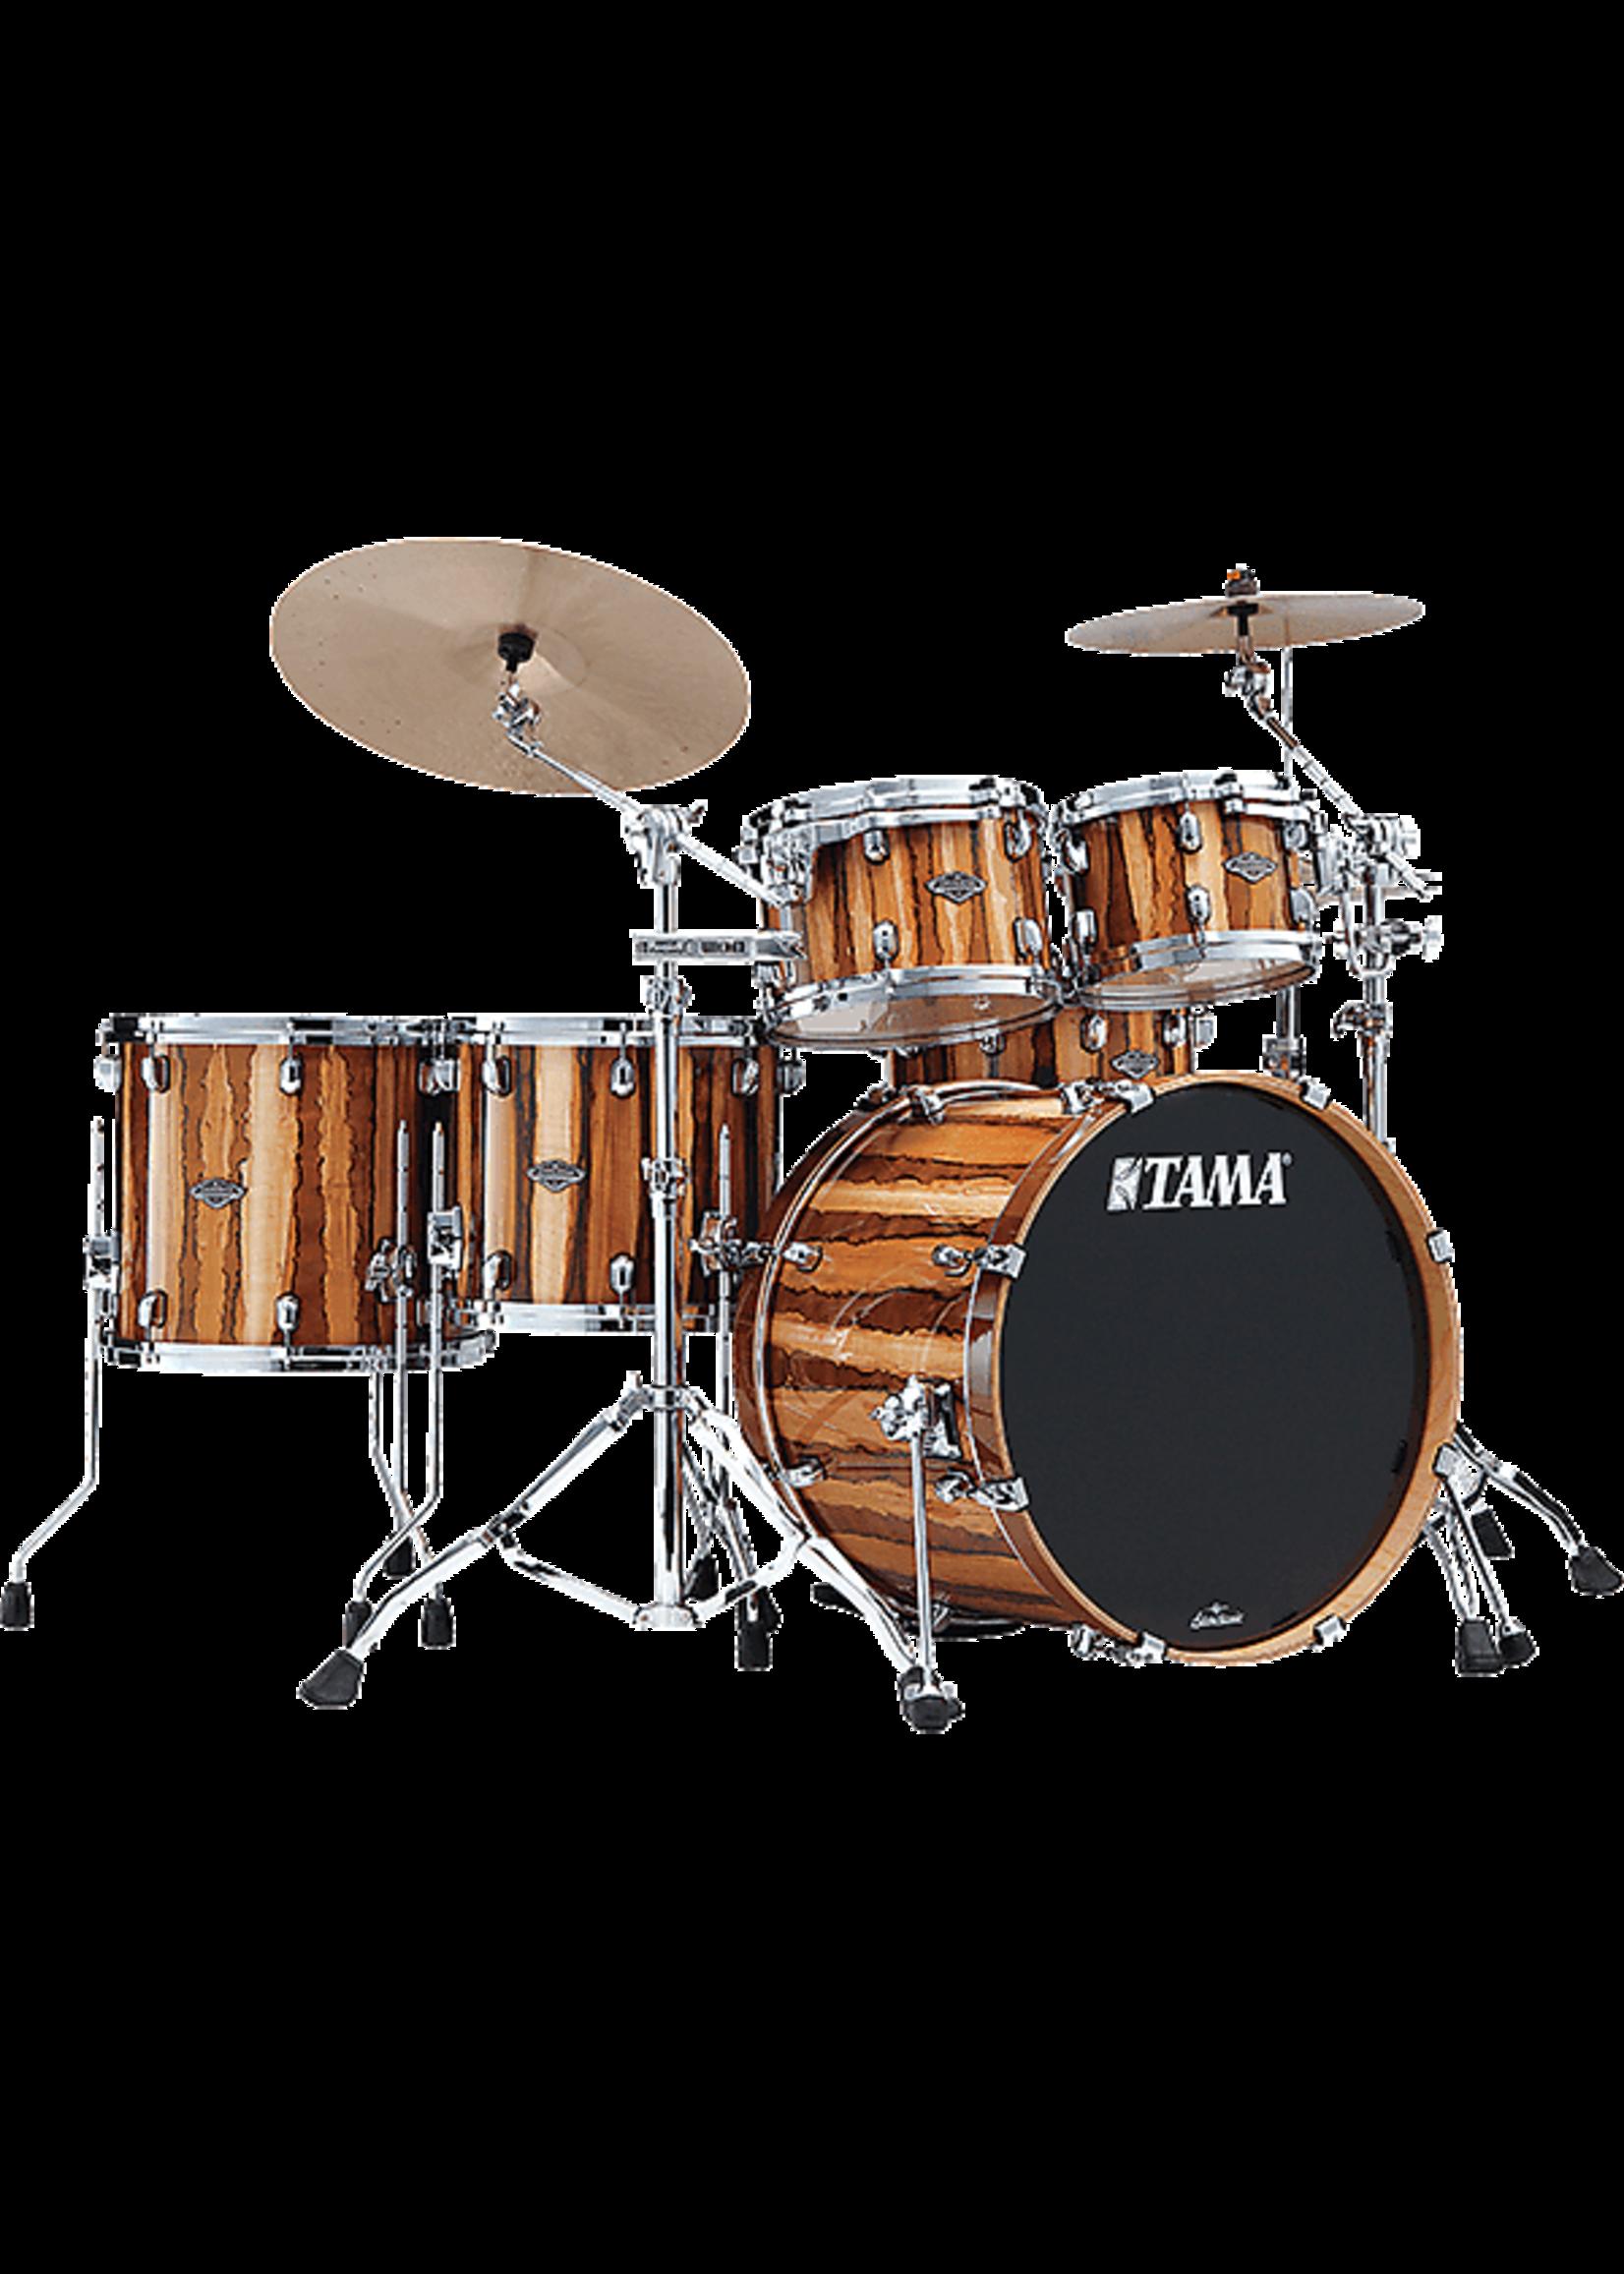 Tama Tama Starclassic Performer Drum Kit - Shell Pack - Carmel Aurora